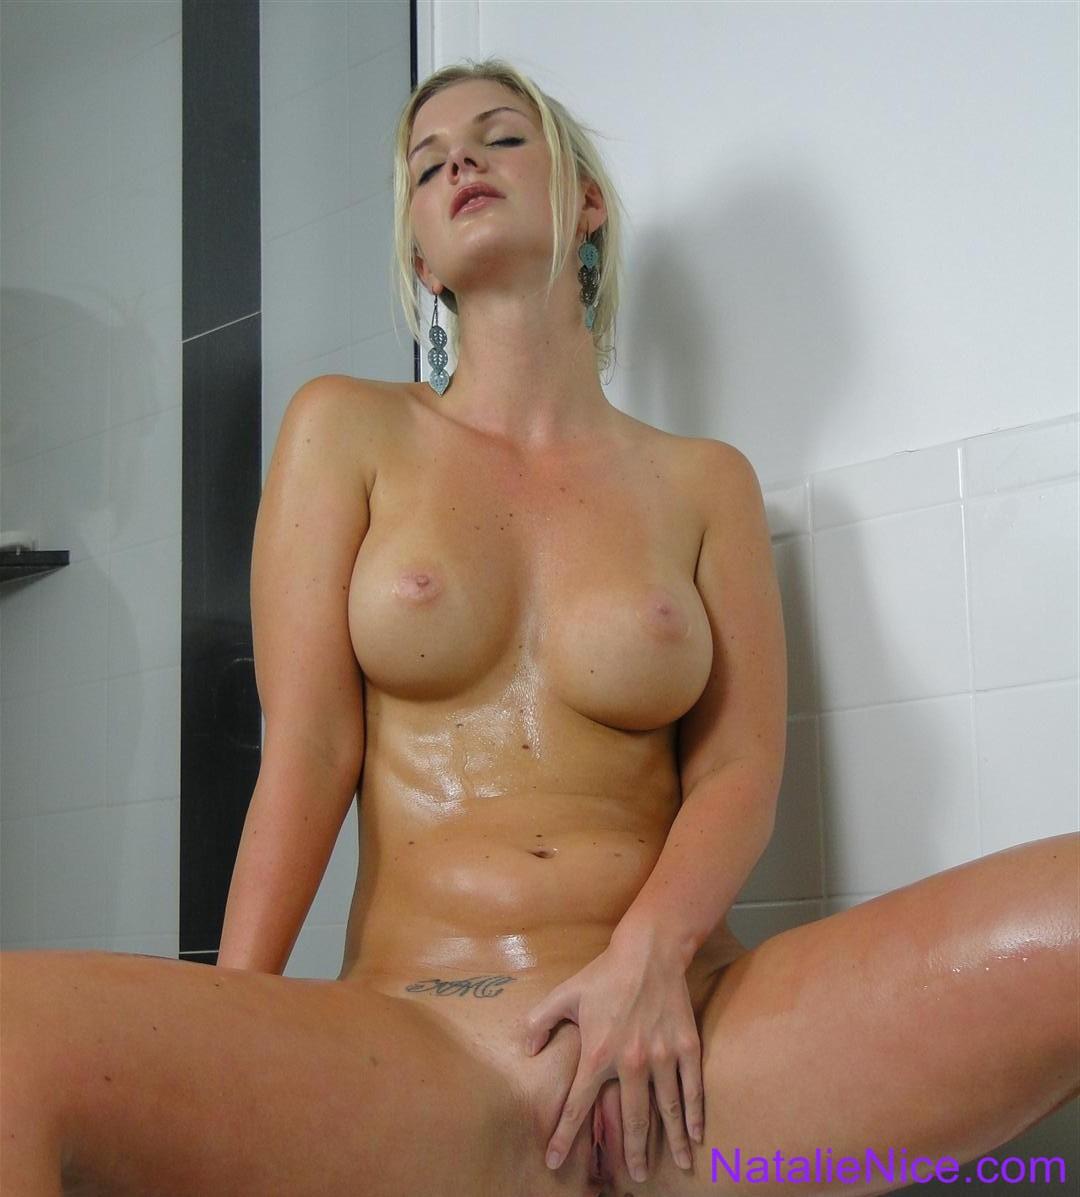 nice ass nude pics   sexy babes wallpaper